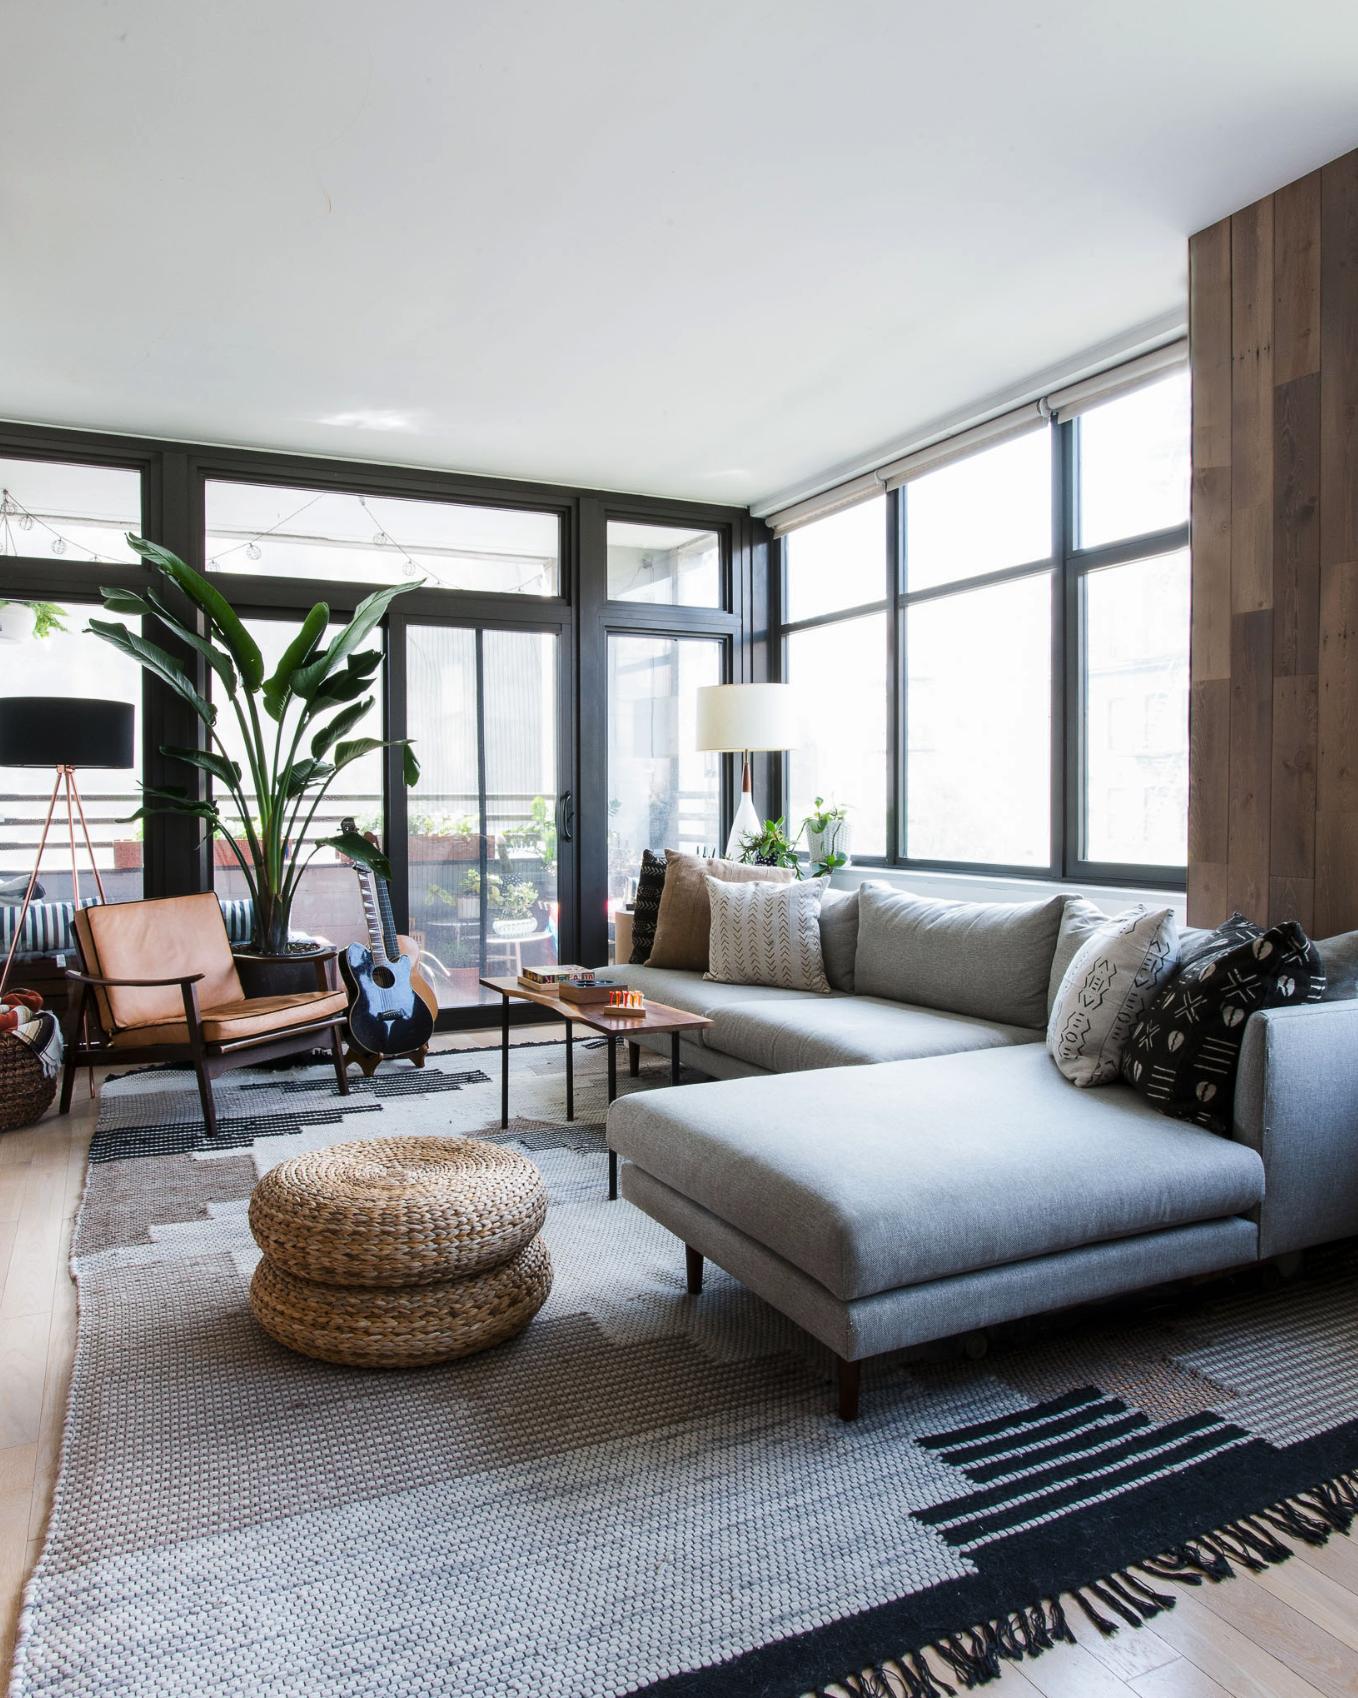 6 living room layout ideas that always work no matter